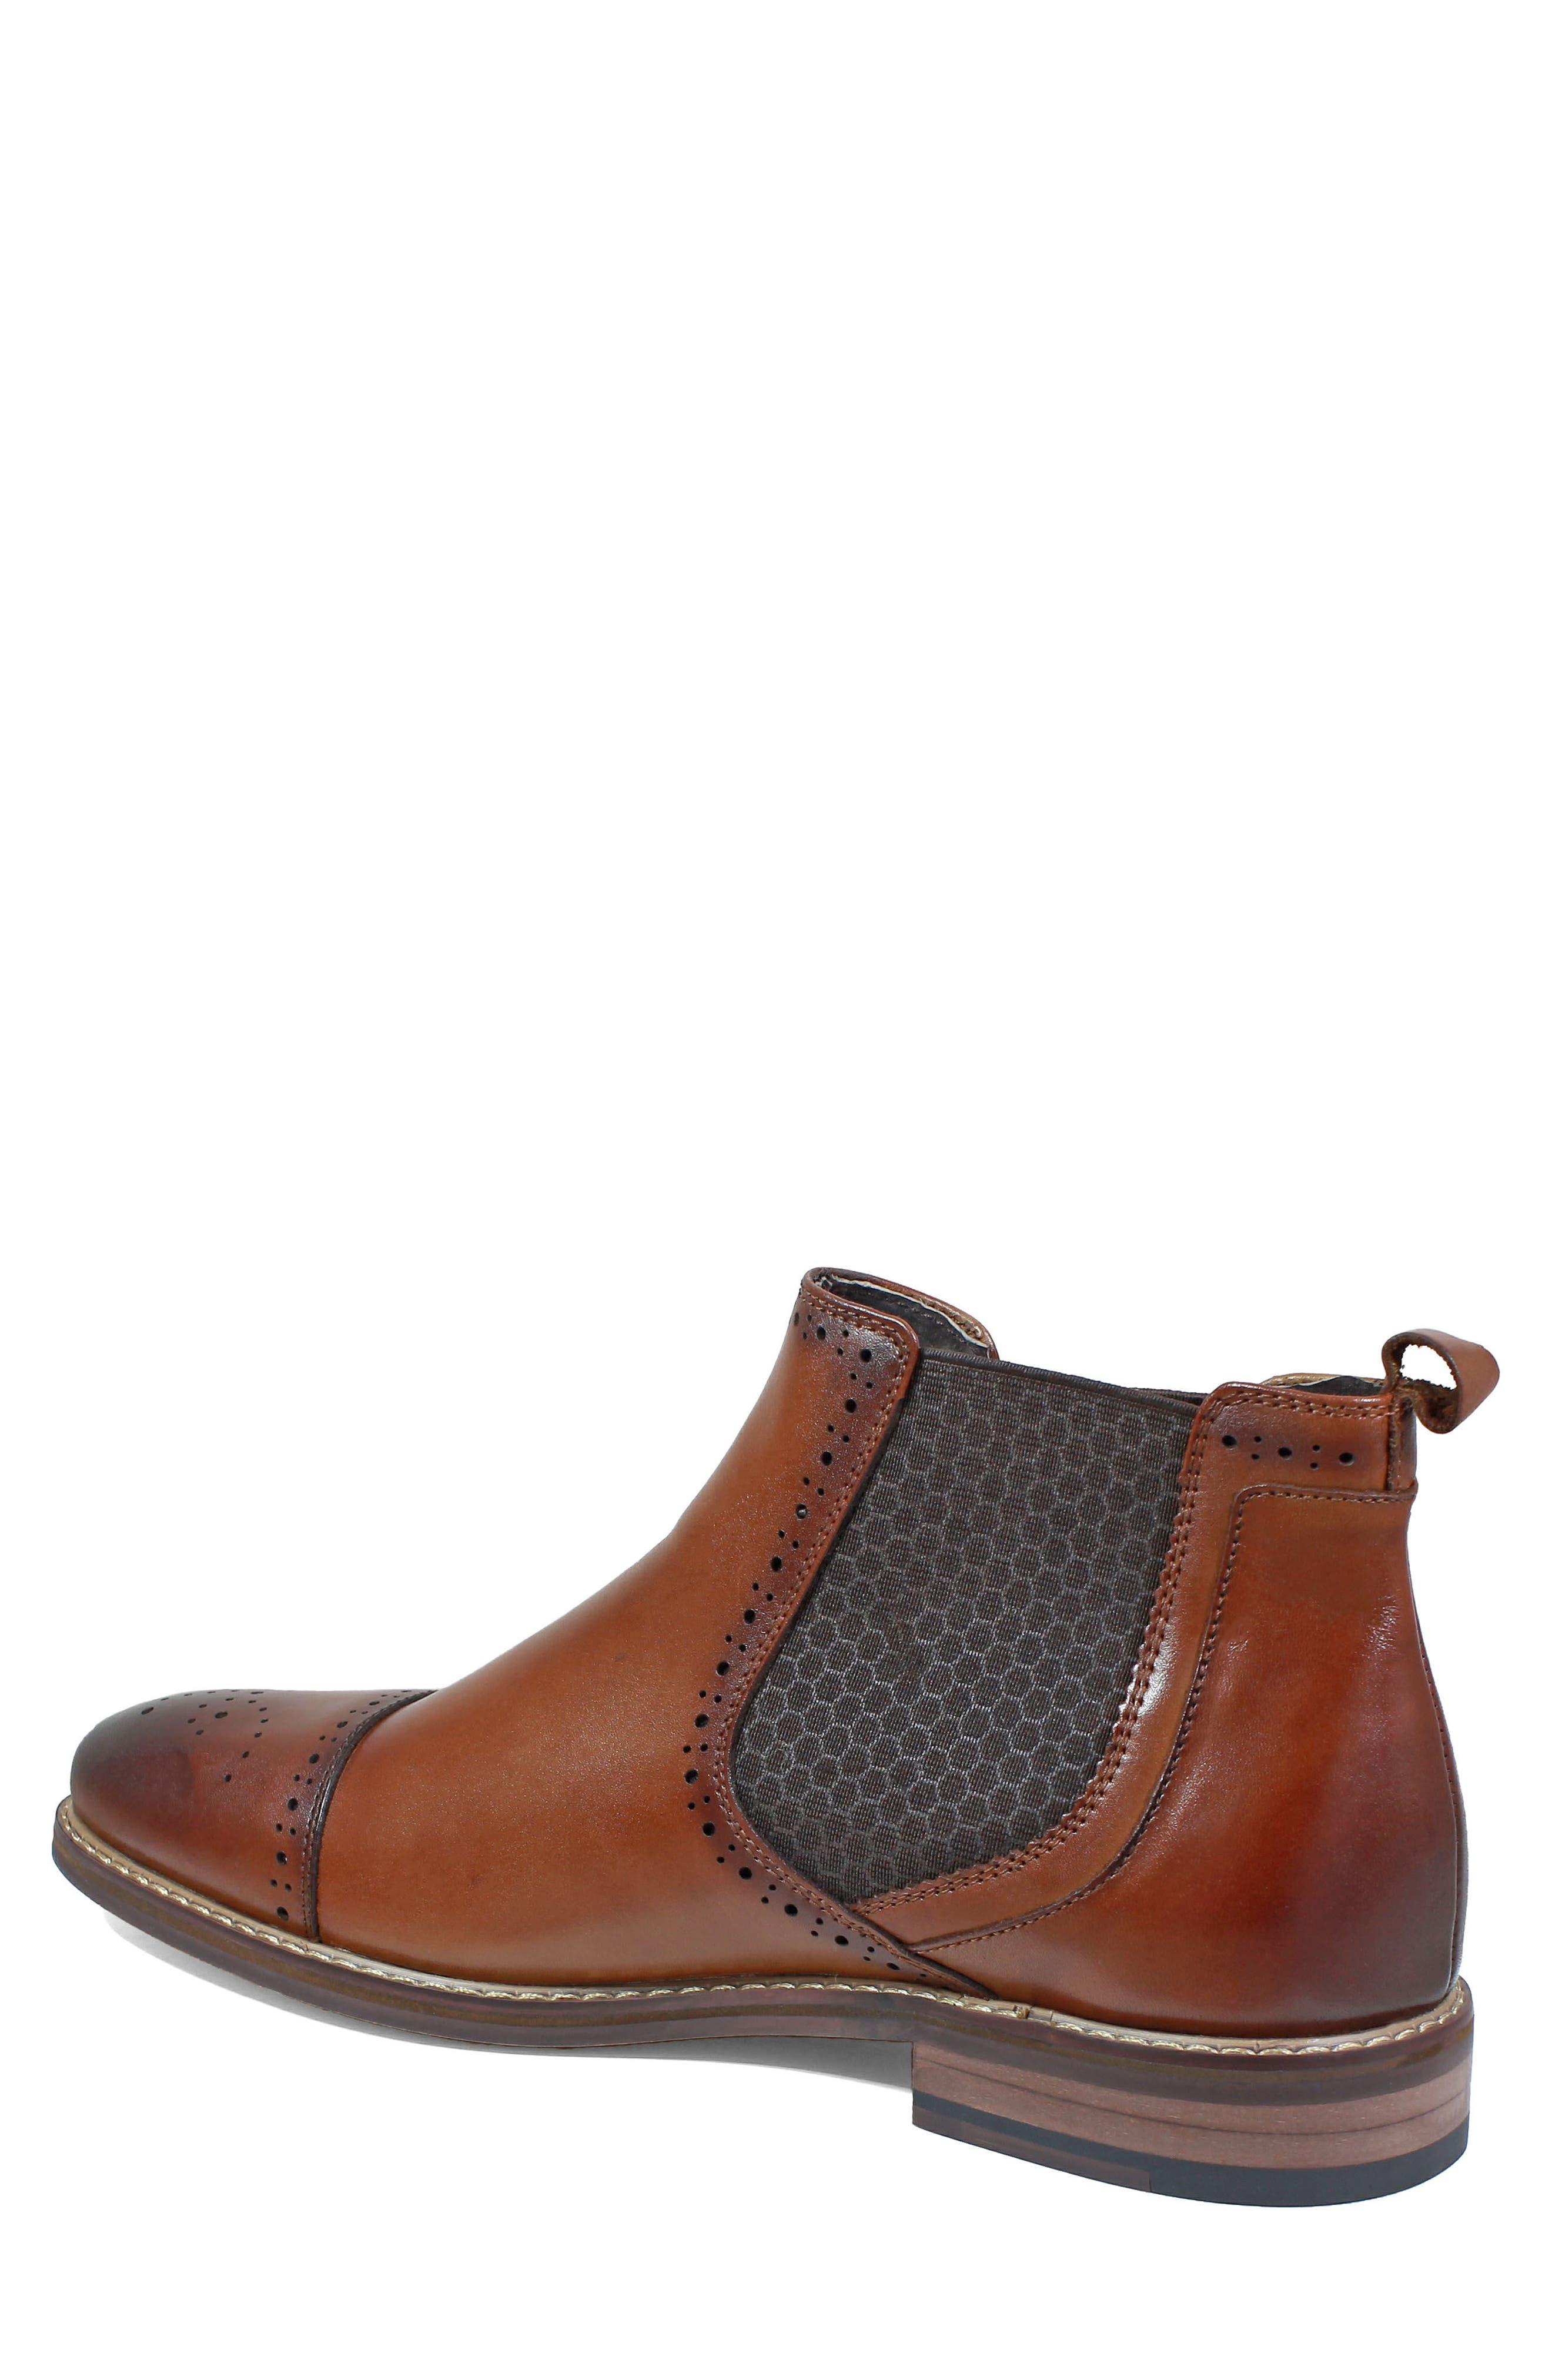 Alomar Chelsea Boot,                             Alternate thumbnail 2, color,                             Cognac Leather